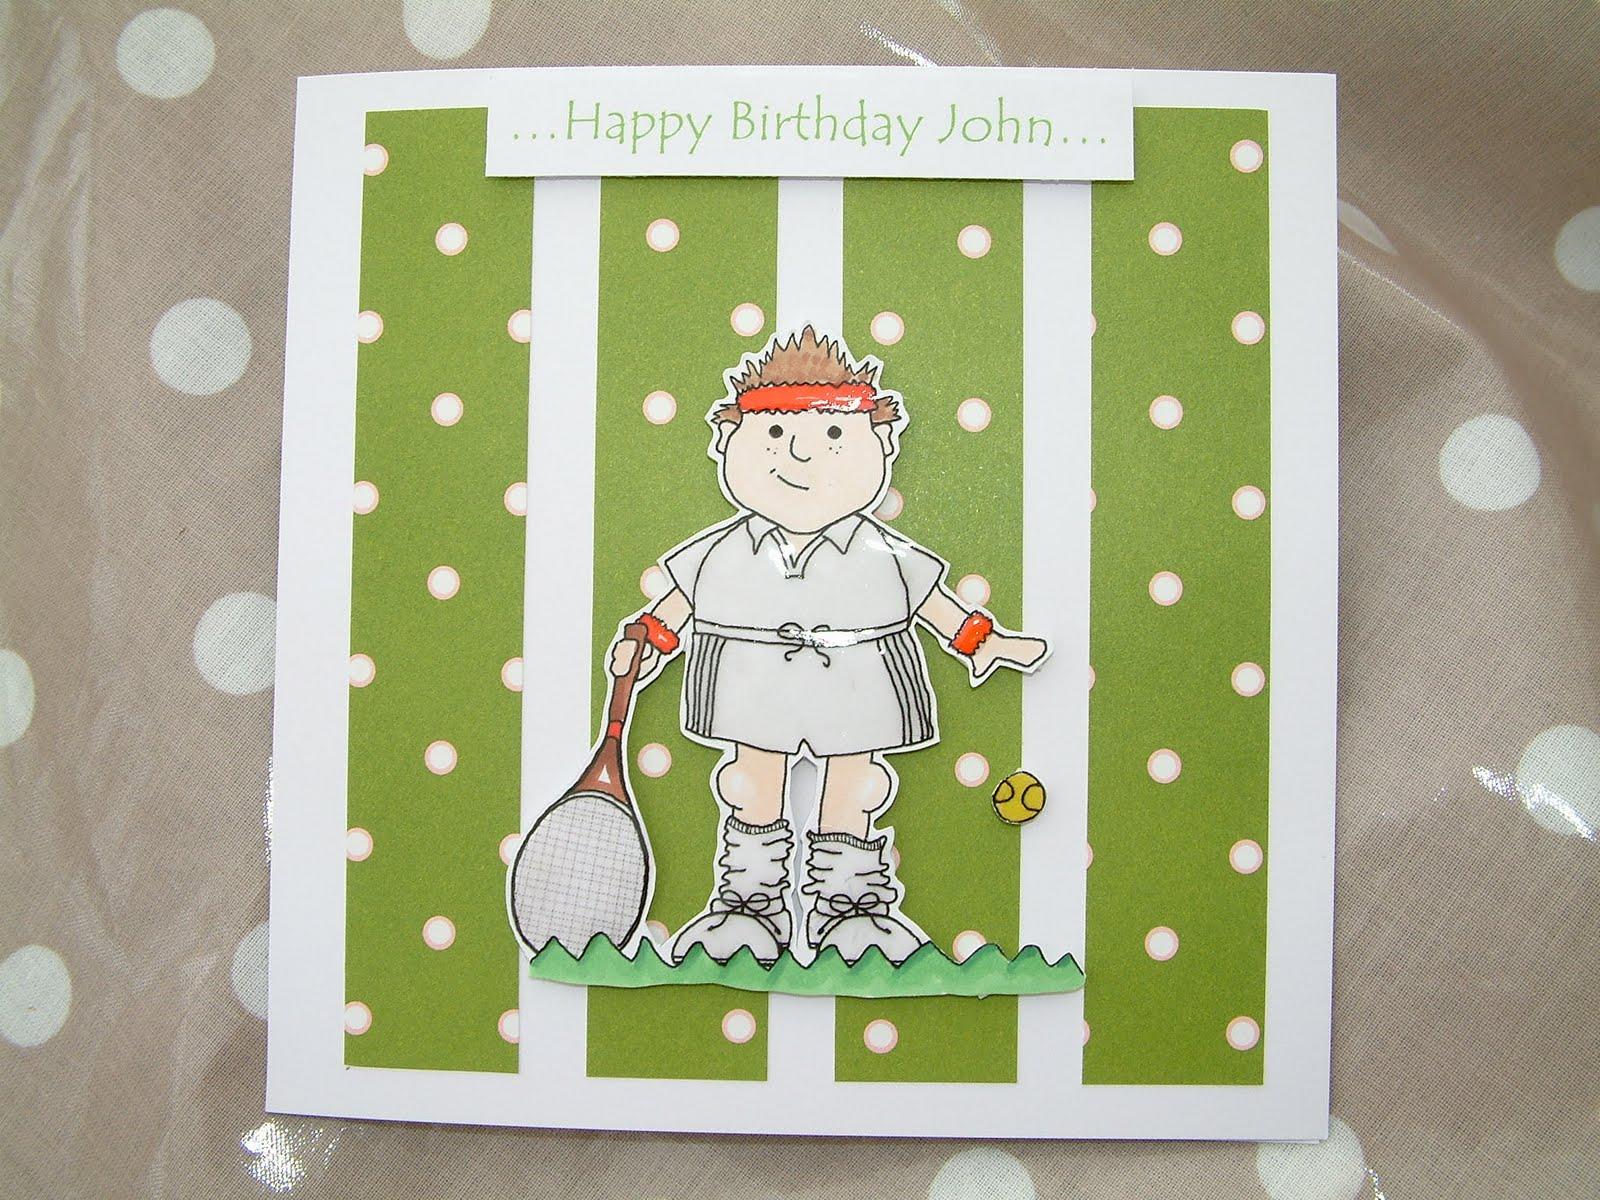 Janeys Cards Tennis Anyone